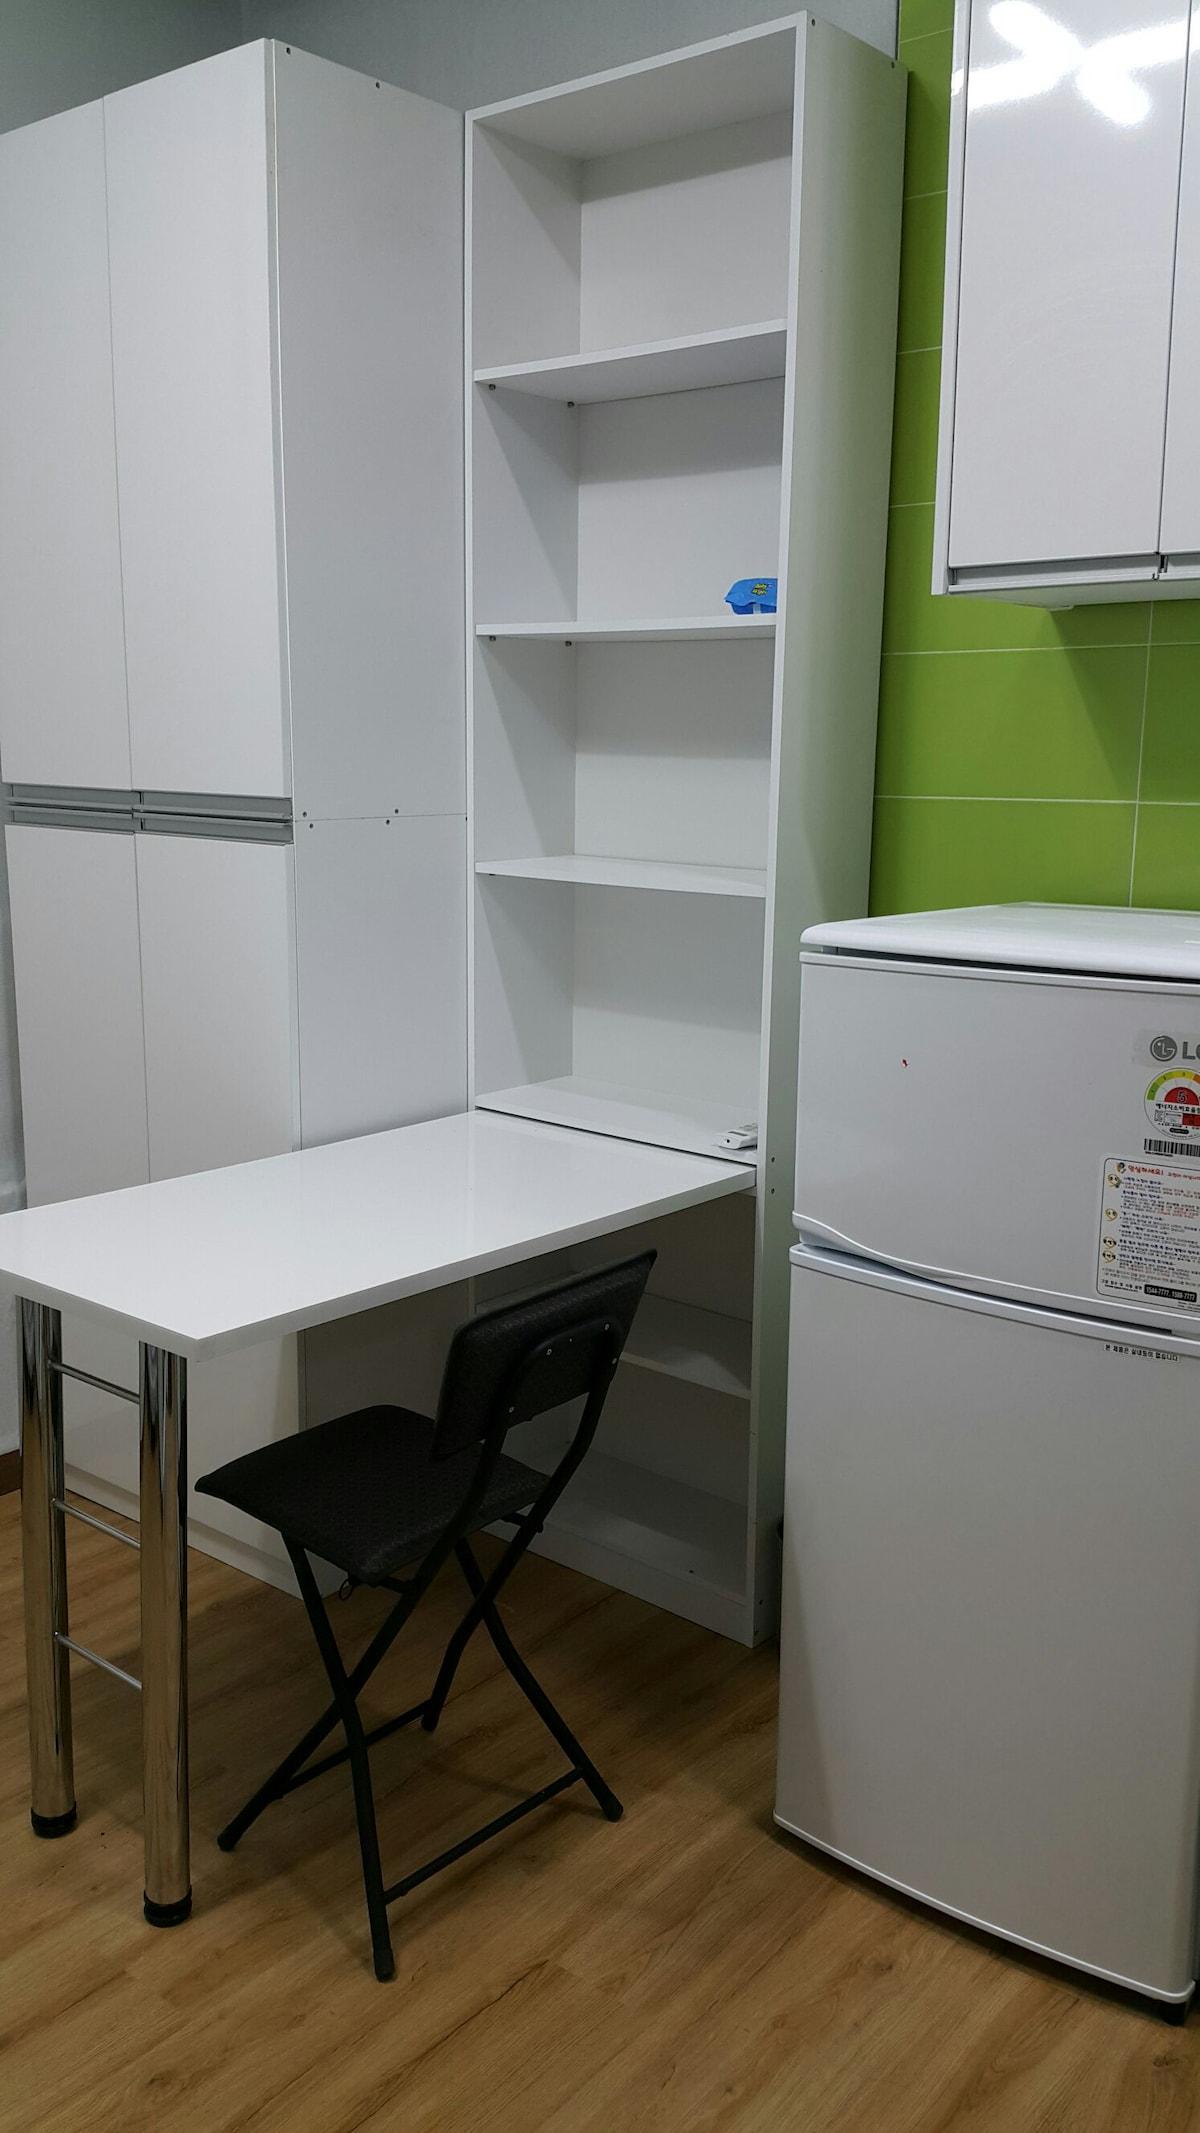 Hansu residence 5 near hanyang uni apartments for rent in 서울특별시 성동구 south korea